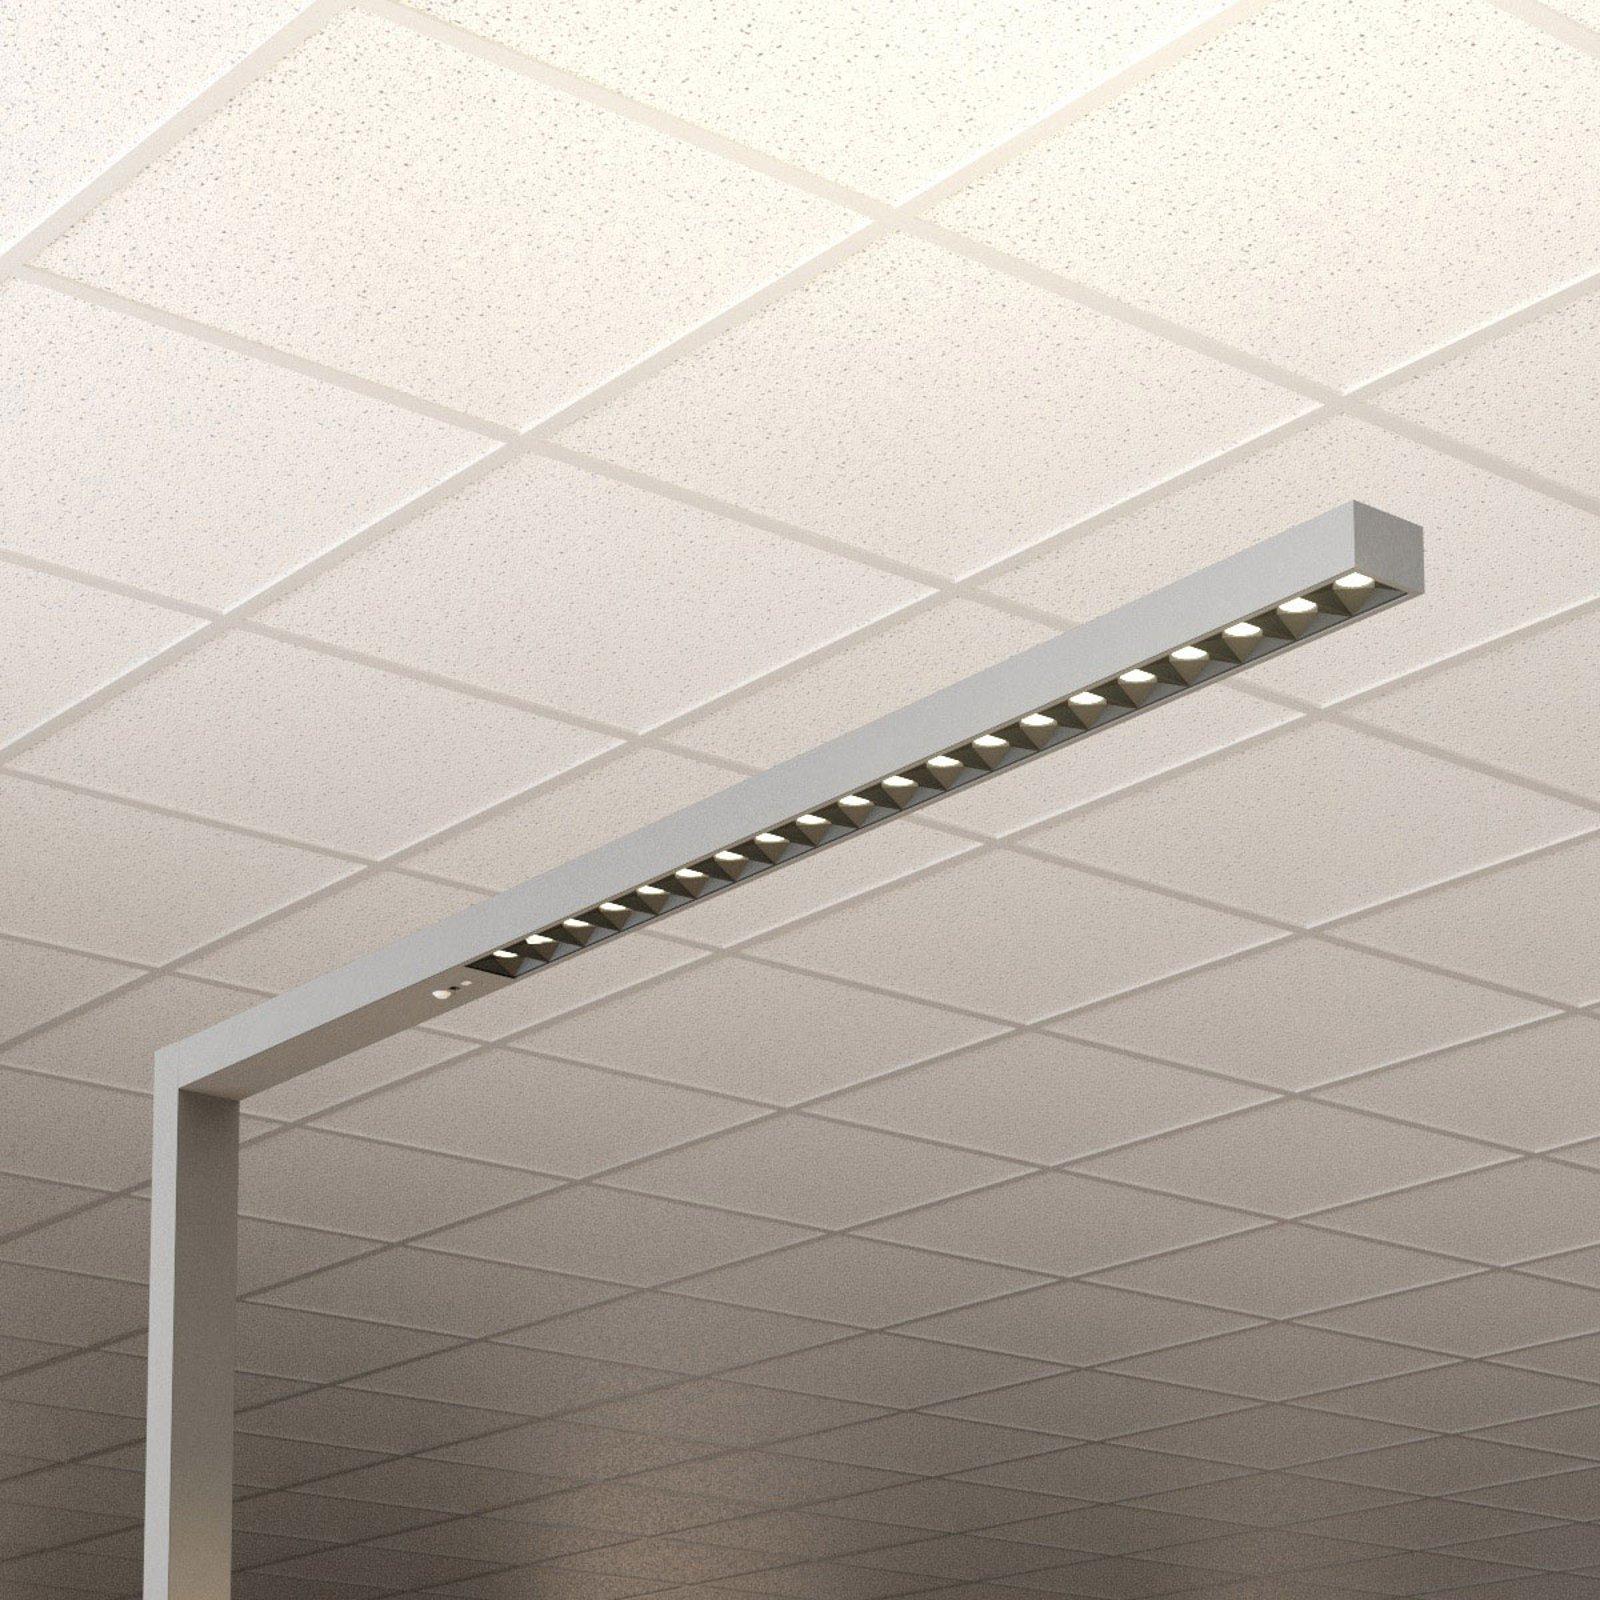 LED-gulvlampe kontor Laris, sølv, 3 000 - 6 000 K